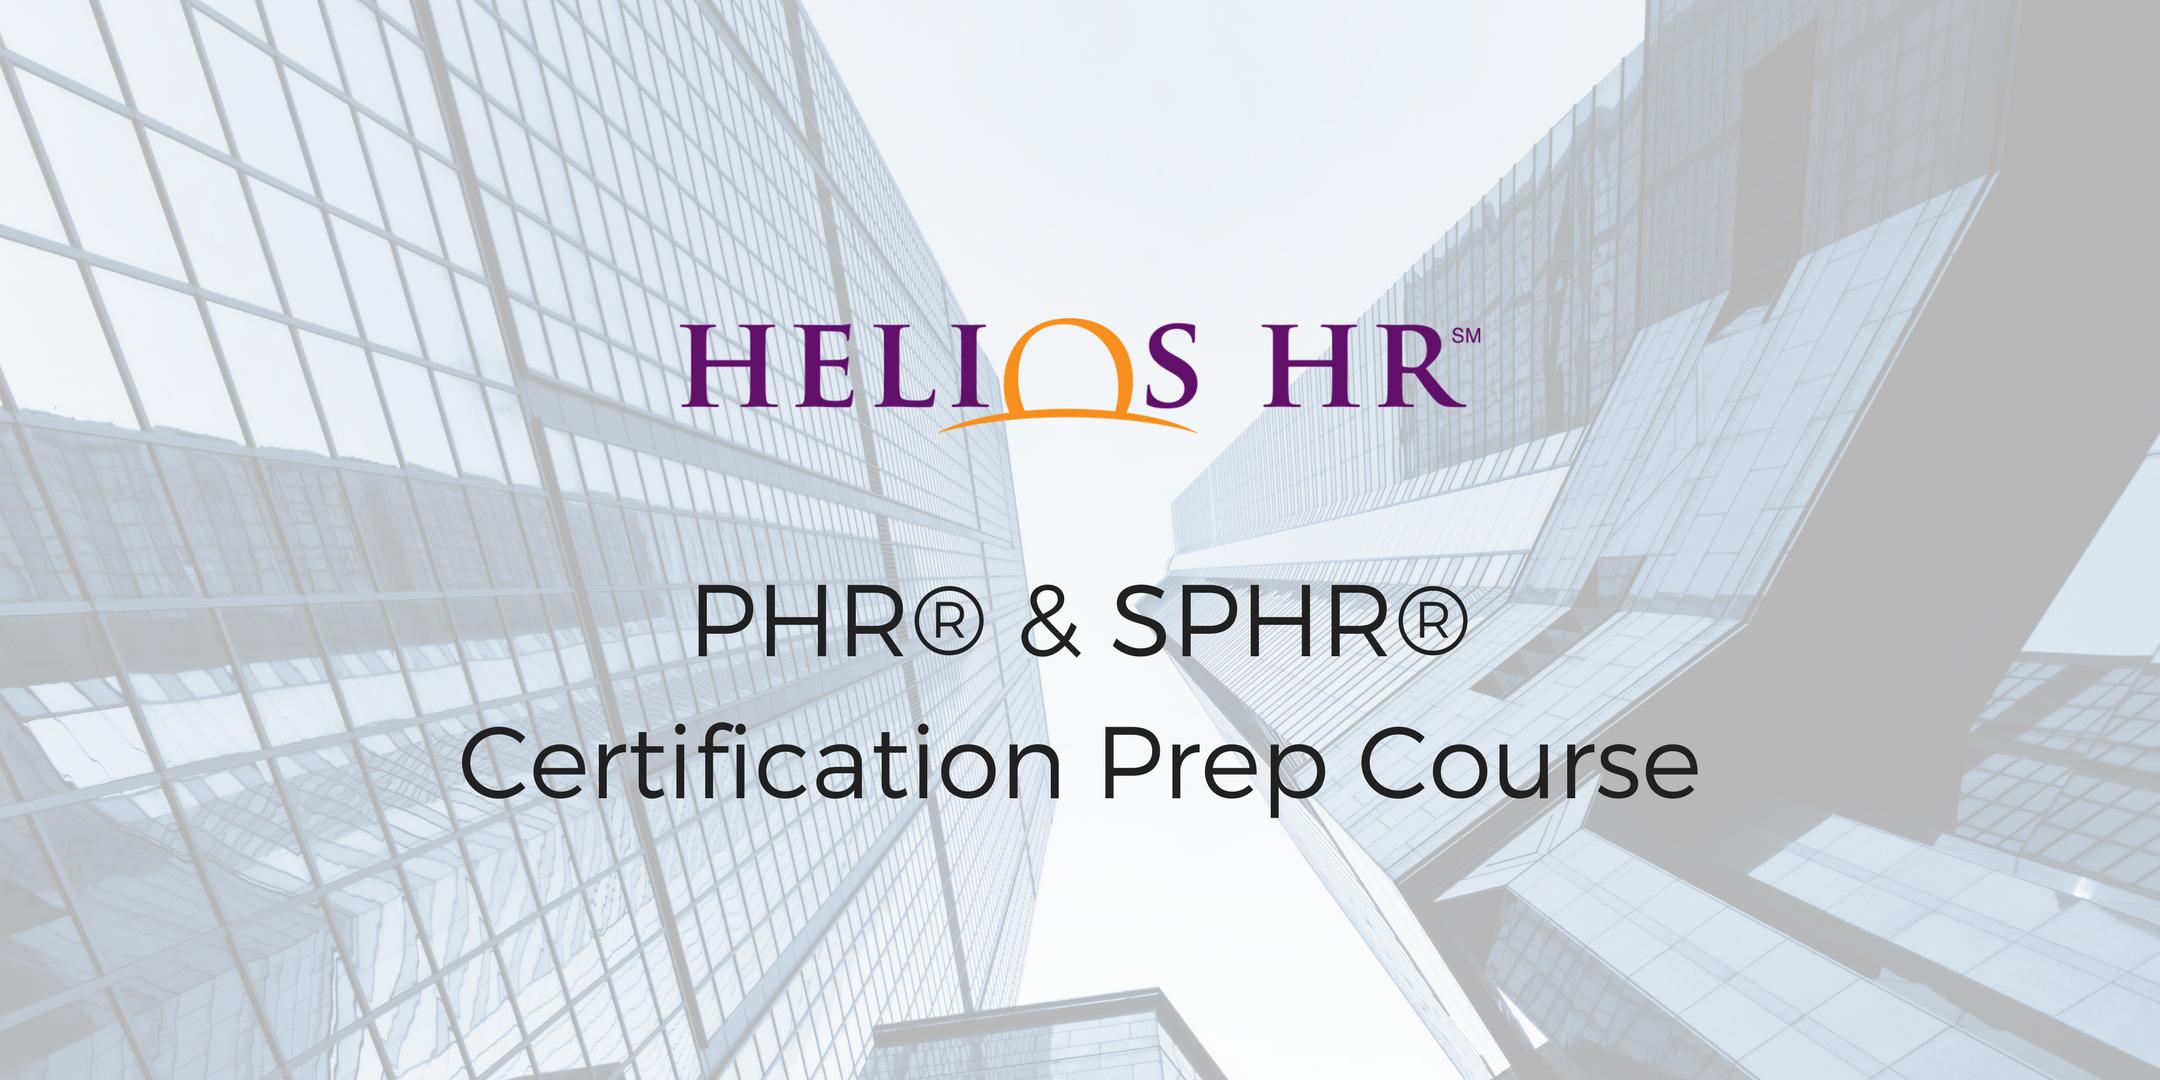 Phr shrm certification prep course 13 mar 2018 phr shrm certification prep course xflitez Gallery